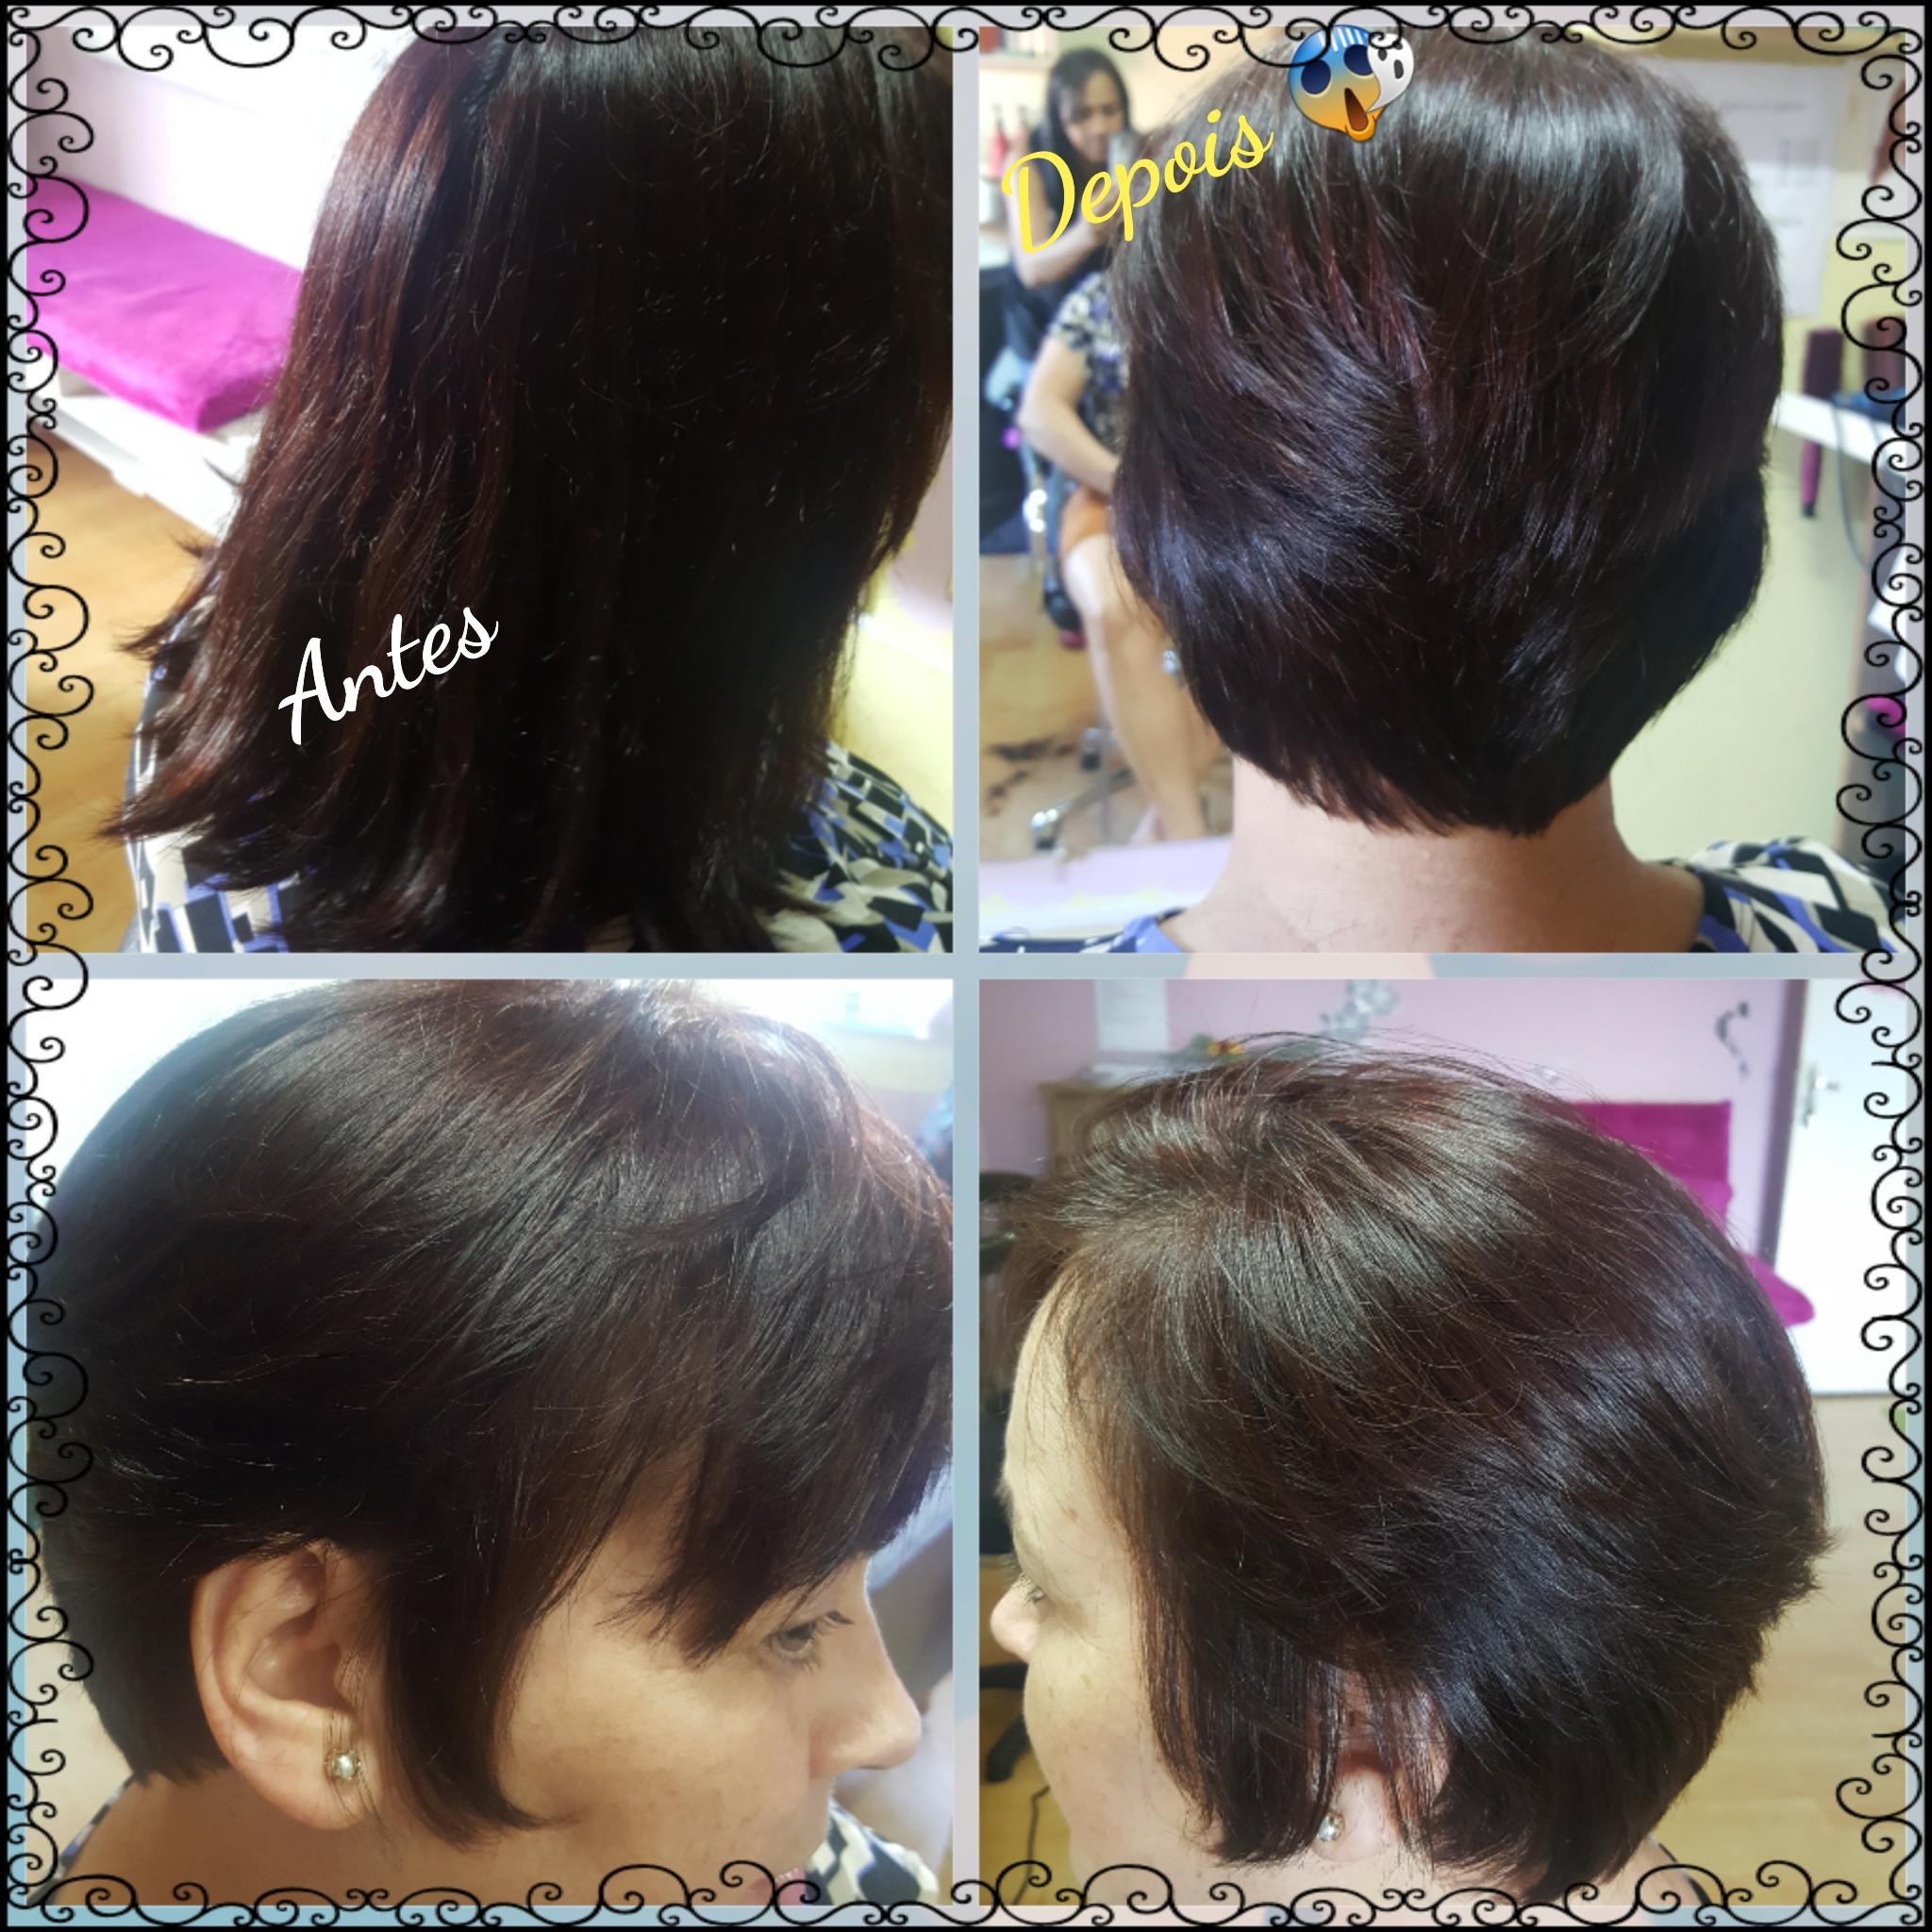 Corte Bob curto repicado  cabelo cabeleireiro(a) manicure e pedicure micropigmentador(a)